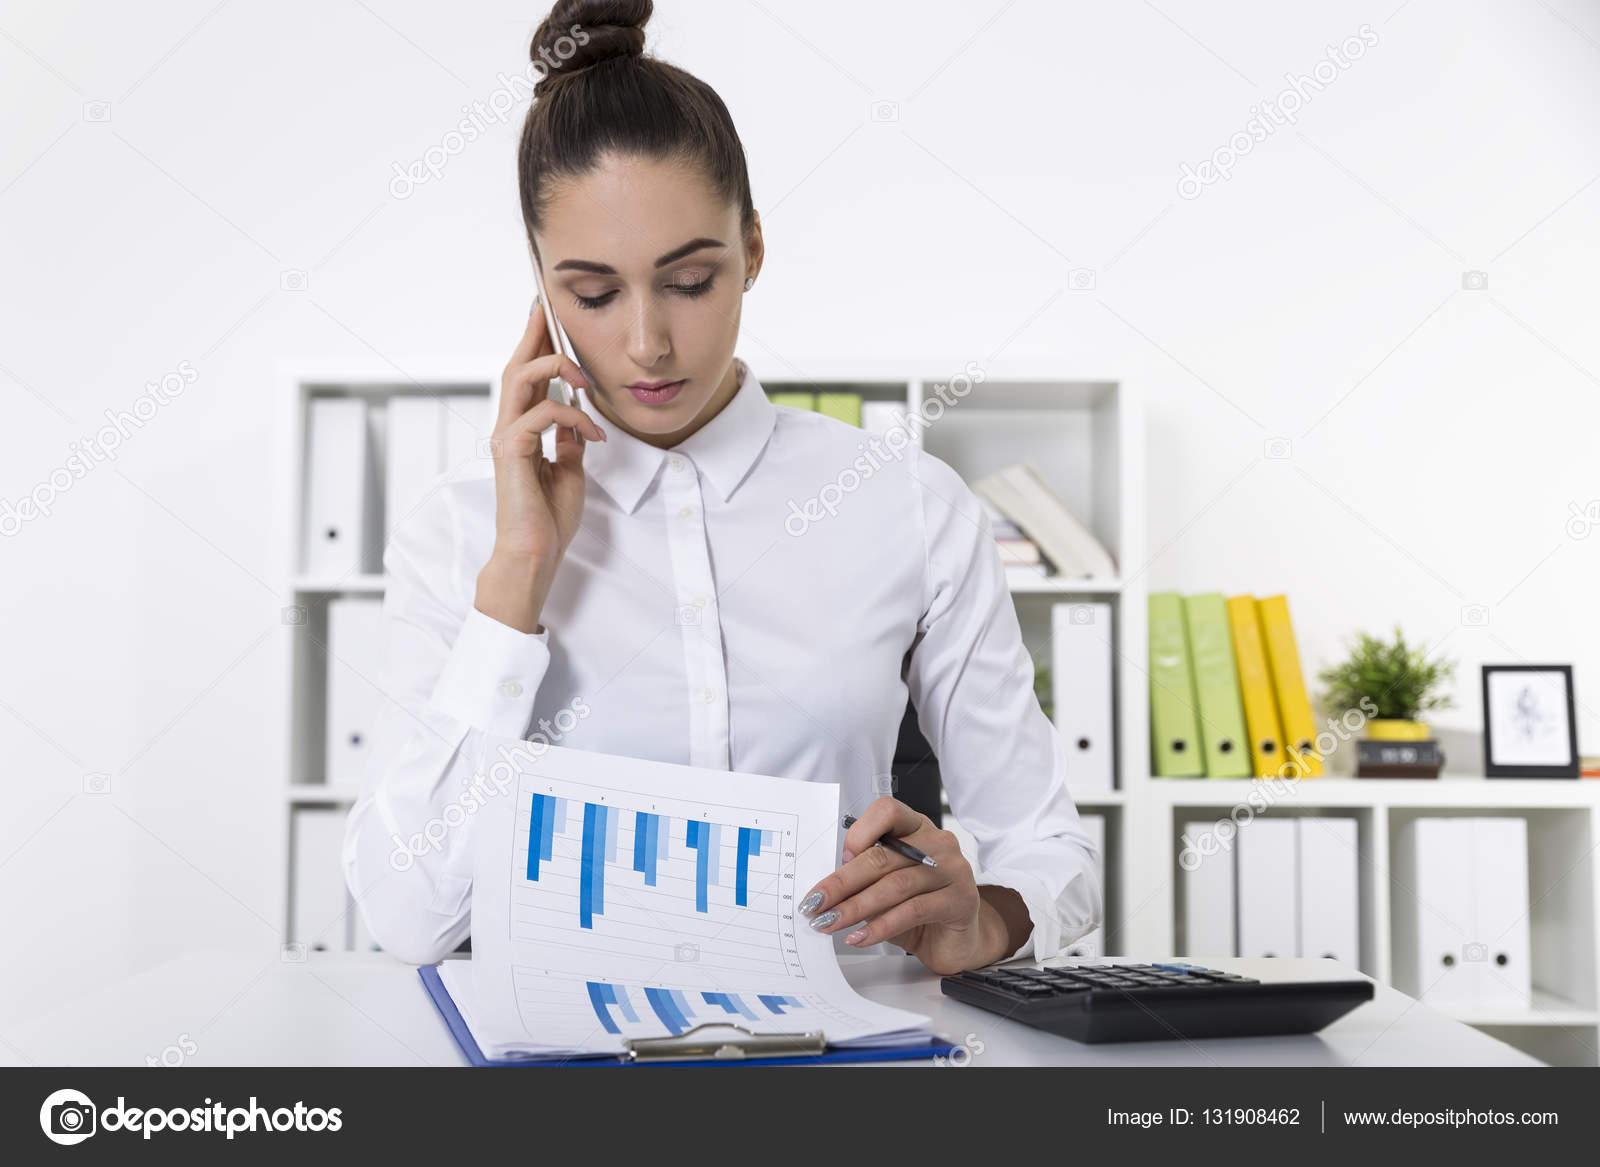 bca2b88f0aca Γυναίκα σε μια λευκή μπλούζα στο κινητό της σε ένα γραφείο που βλέπουν μια– εικόνα  αρχείου